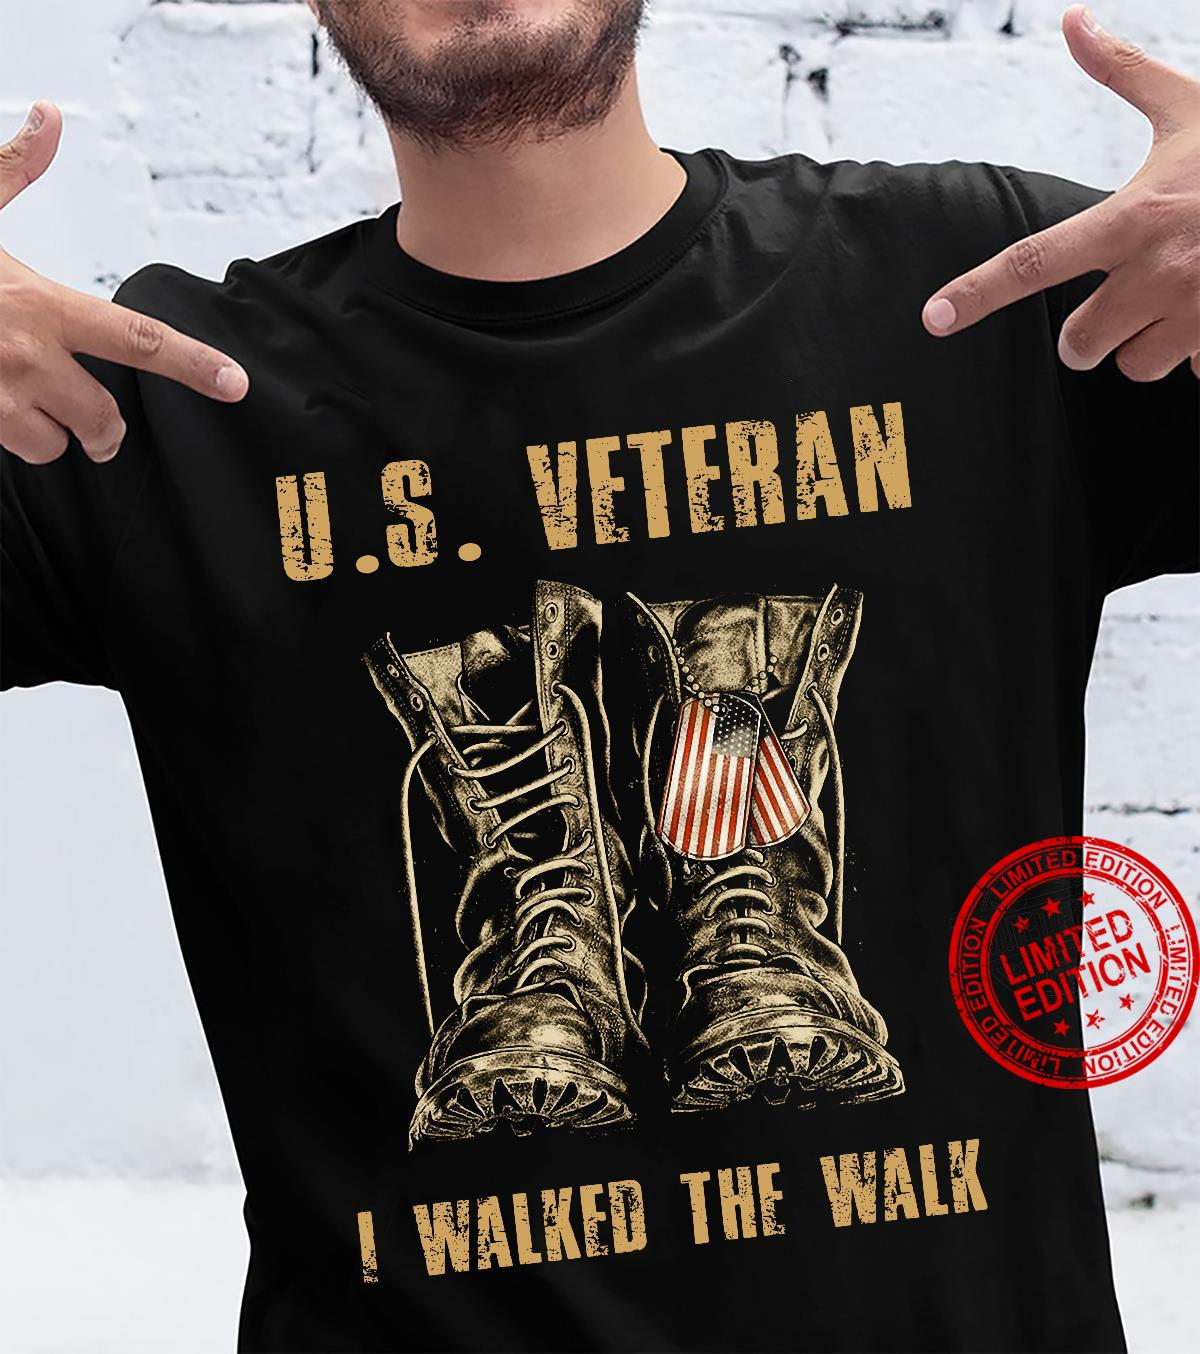 The boots US veteran I walked the walk shirt